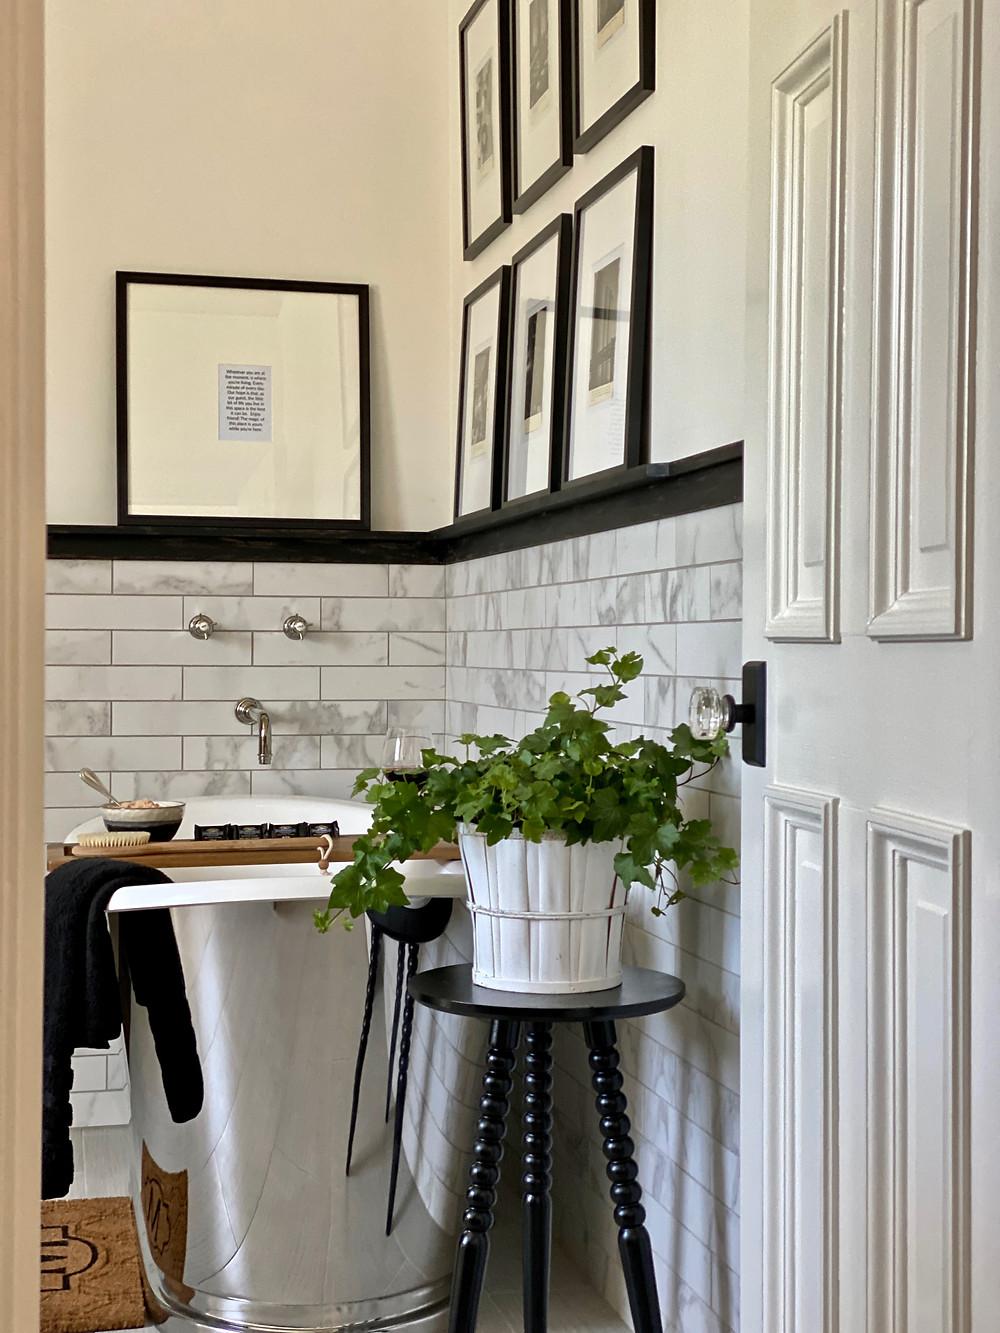 Stainless steel tub, black and white bathroom, spa bath,